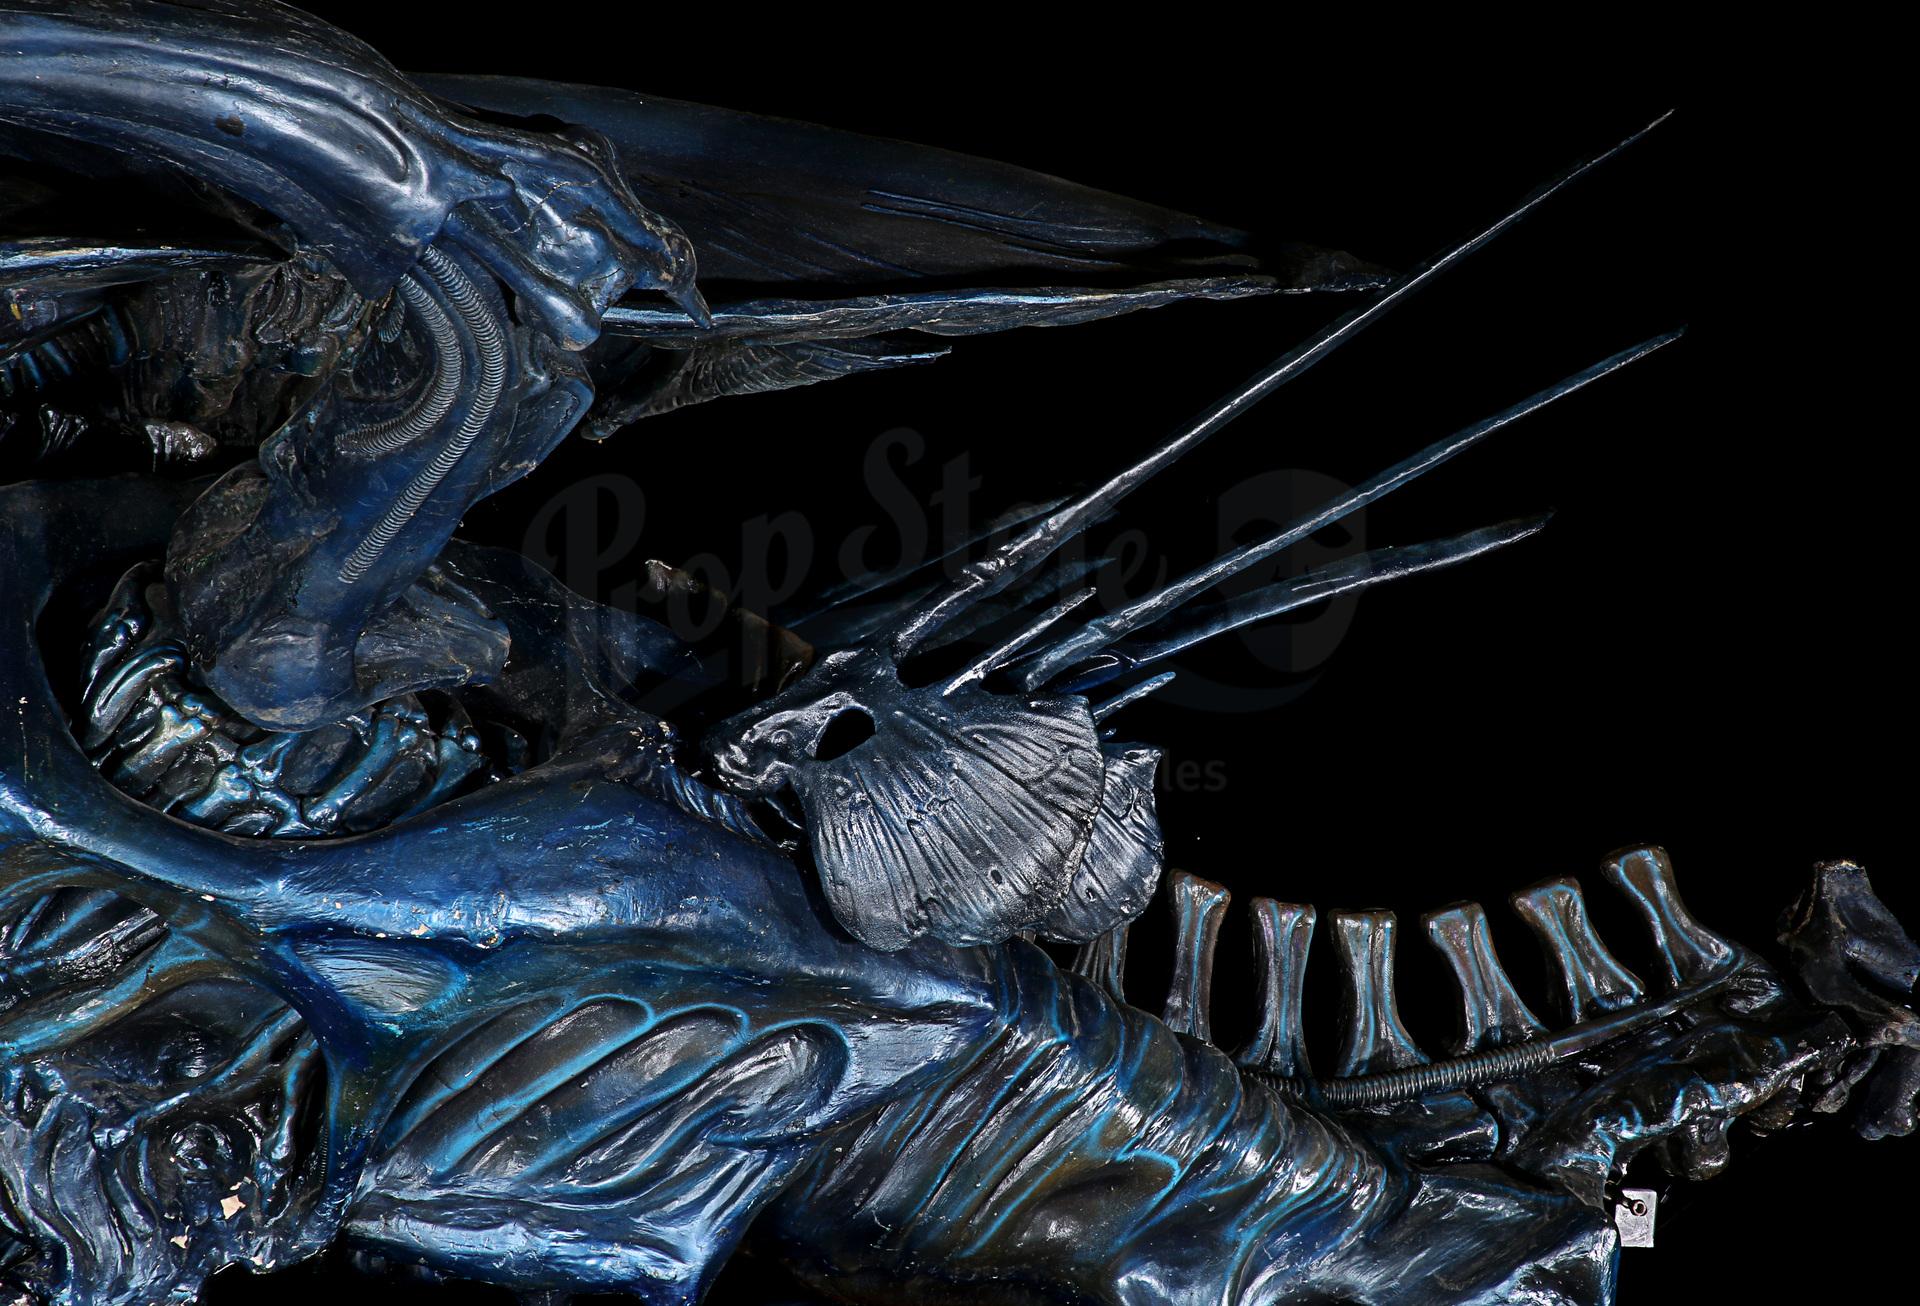 ALIENS (1986) - Full-size Promotional Alien Queen - Image 24 of 38